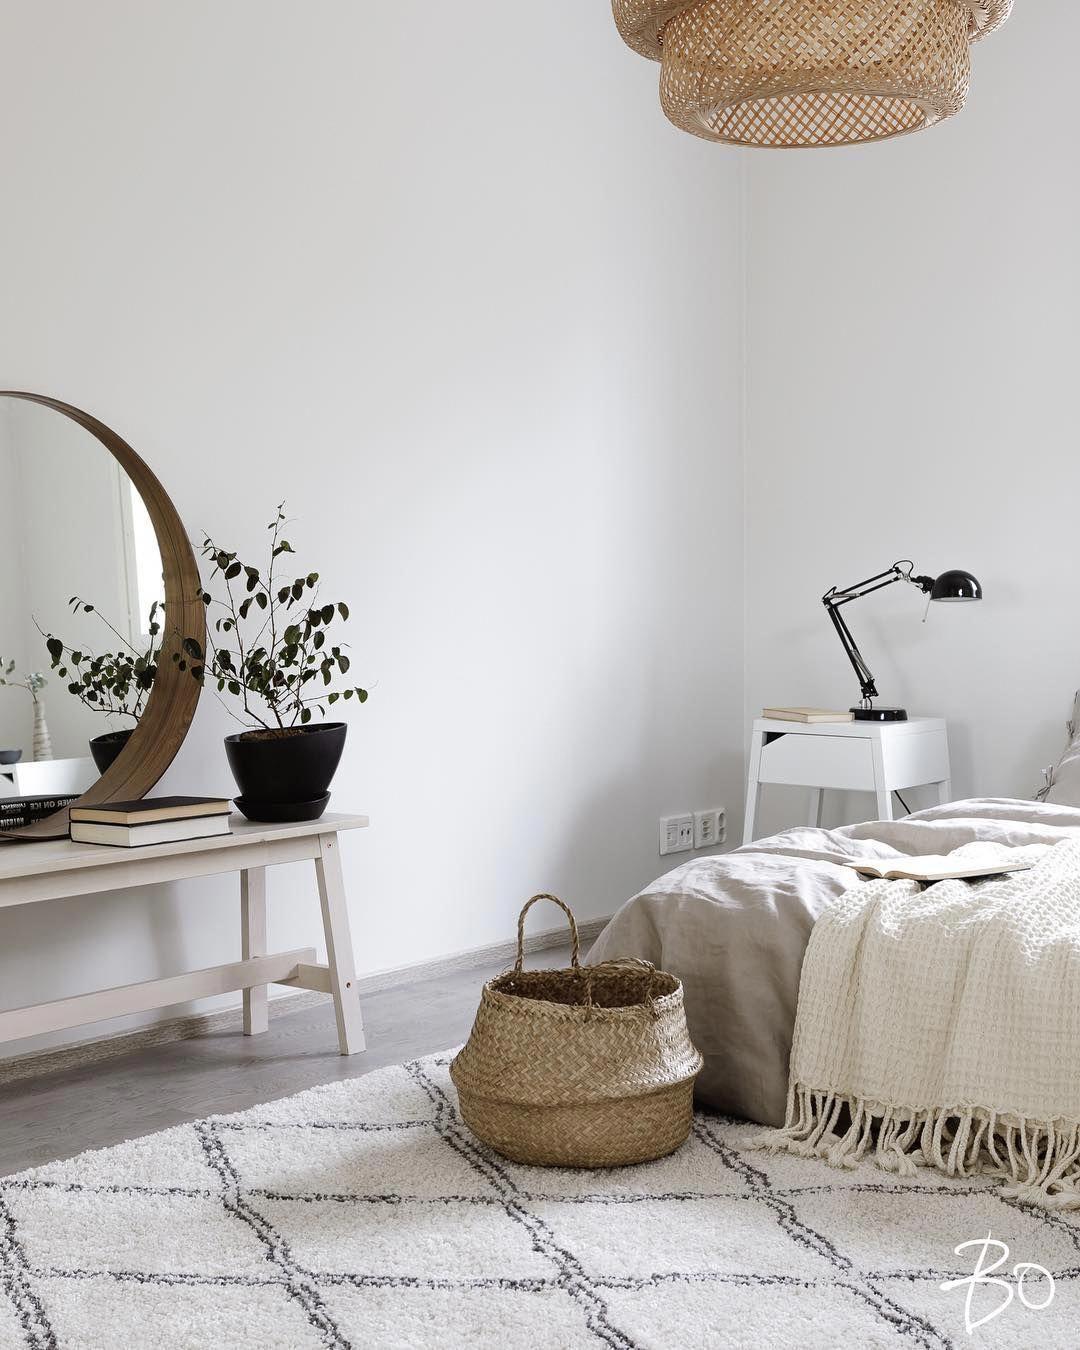 Ikea Selje Nightstand Stockholm Mirror Bench